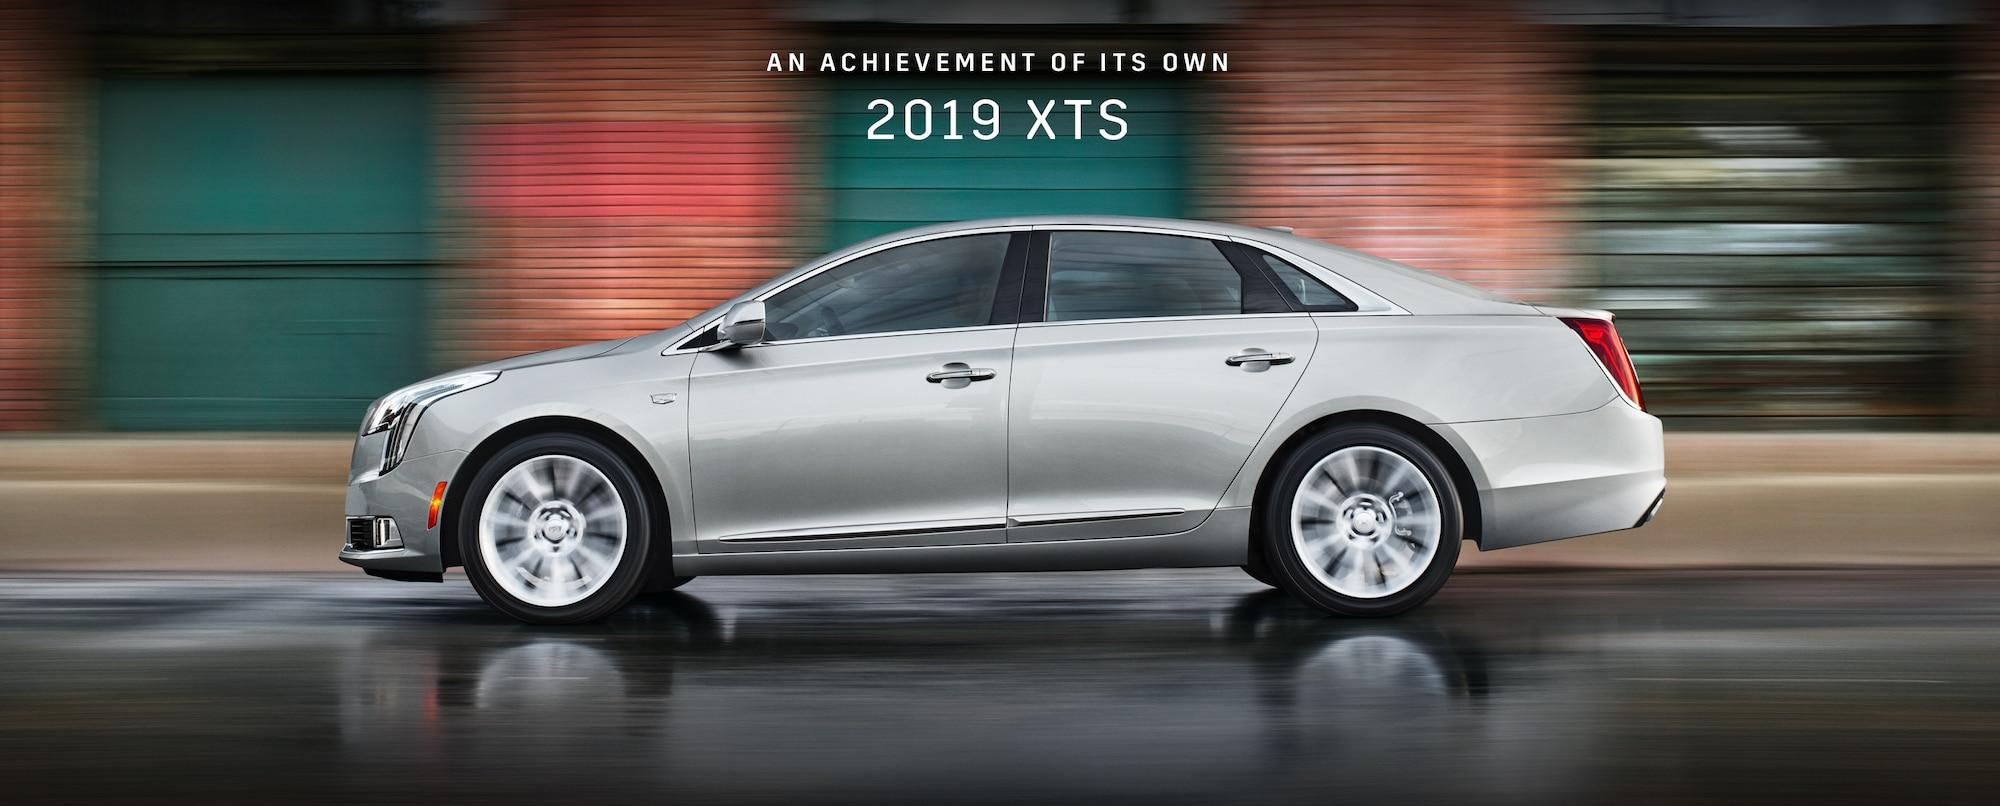 Xts Wiring Diagram Schematic Harness 2019 Sedan Cadillacrhcadillac At